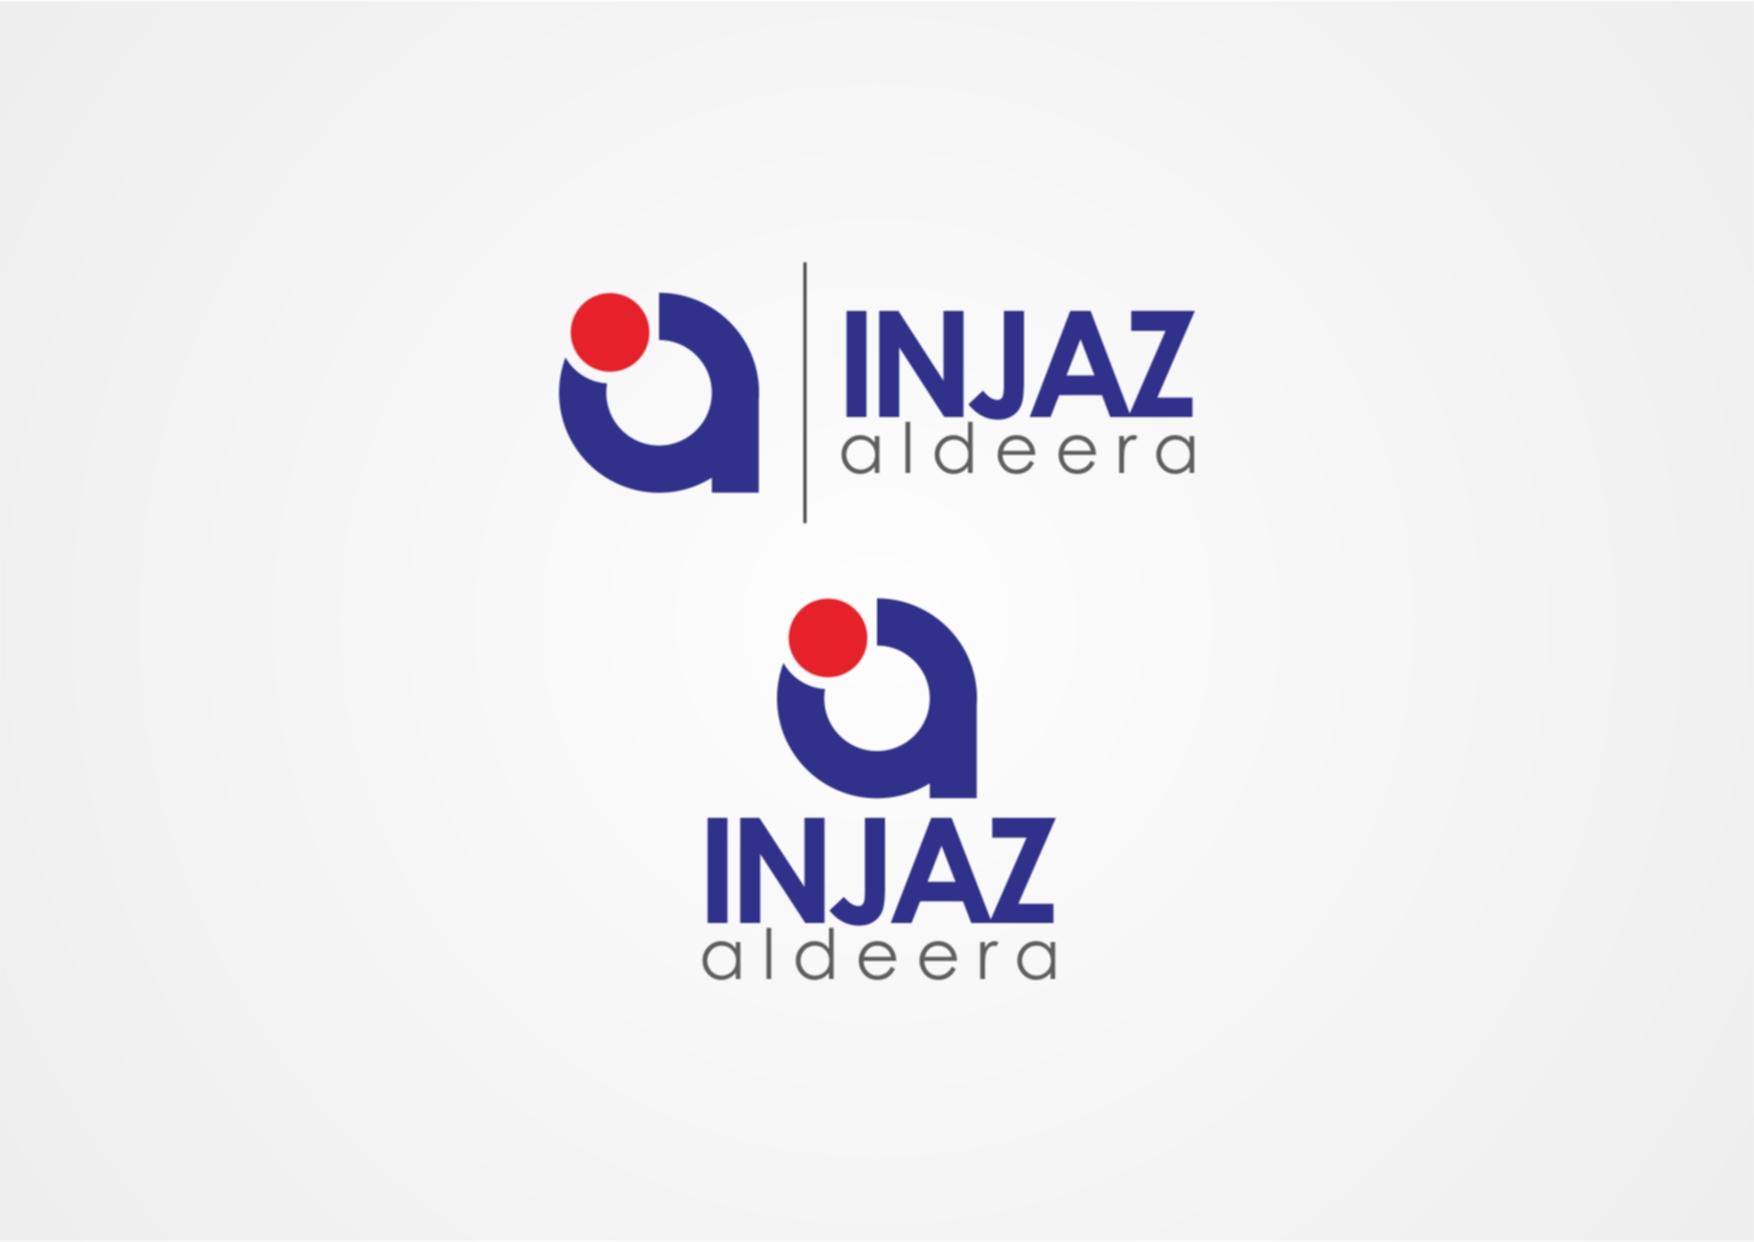 Logo Design by Private User - Entry No. 11 in the Logo Design Contest Fun Logo Design for Injaz aldeera.